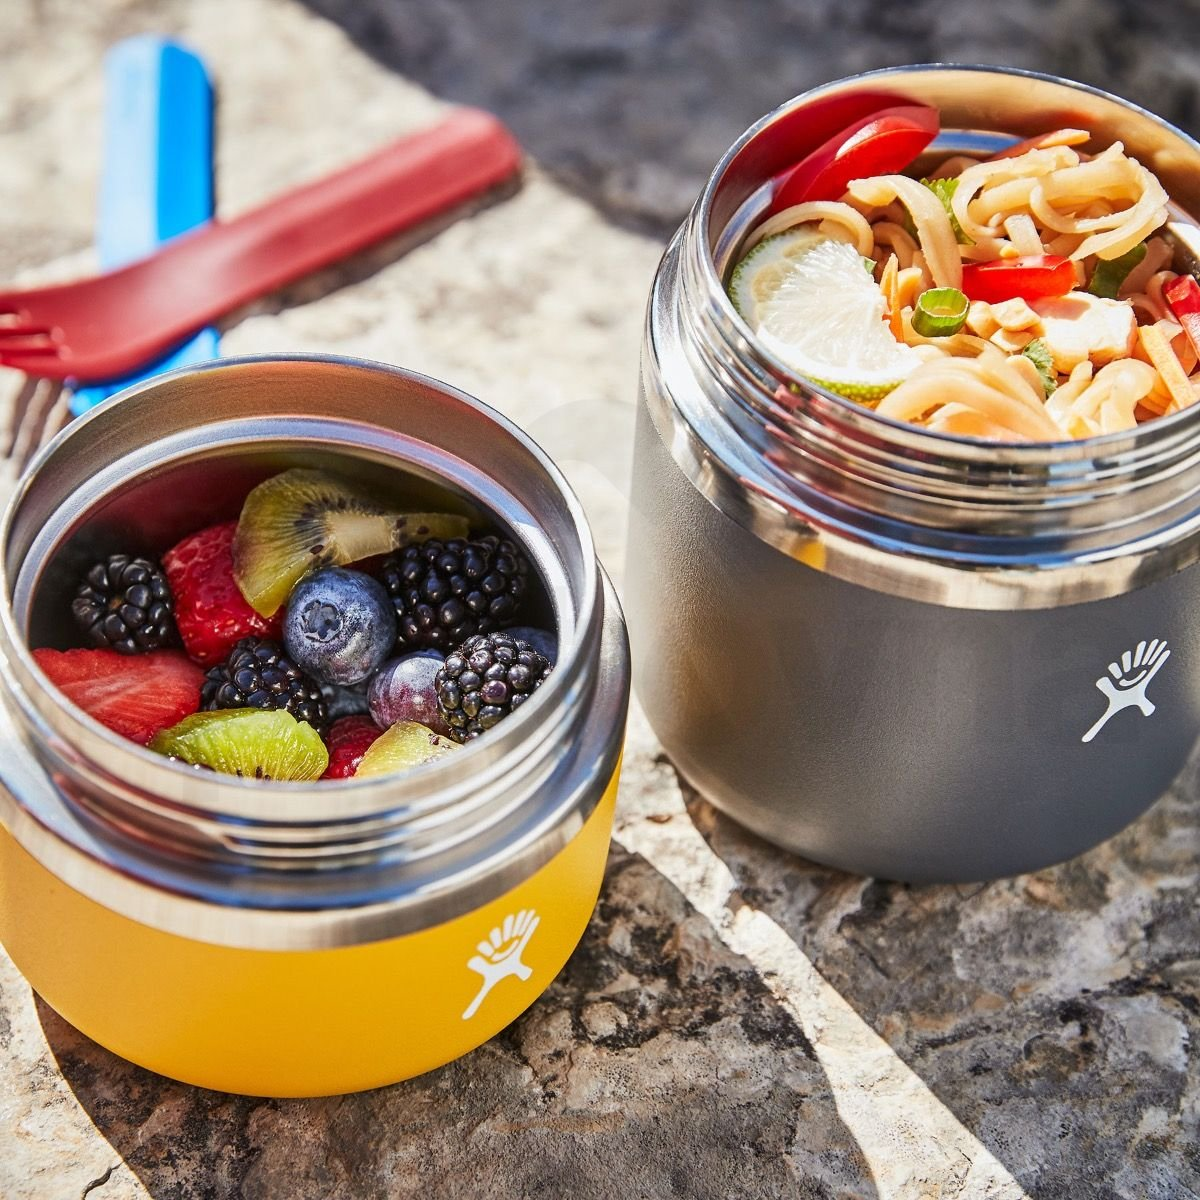 Termoska na jídlo Hydro Flask 20 oz Insulated Food Jar - žlutá